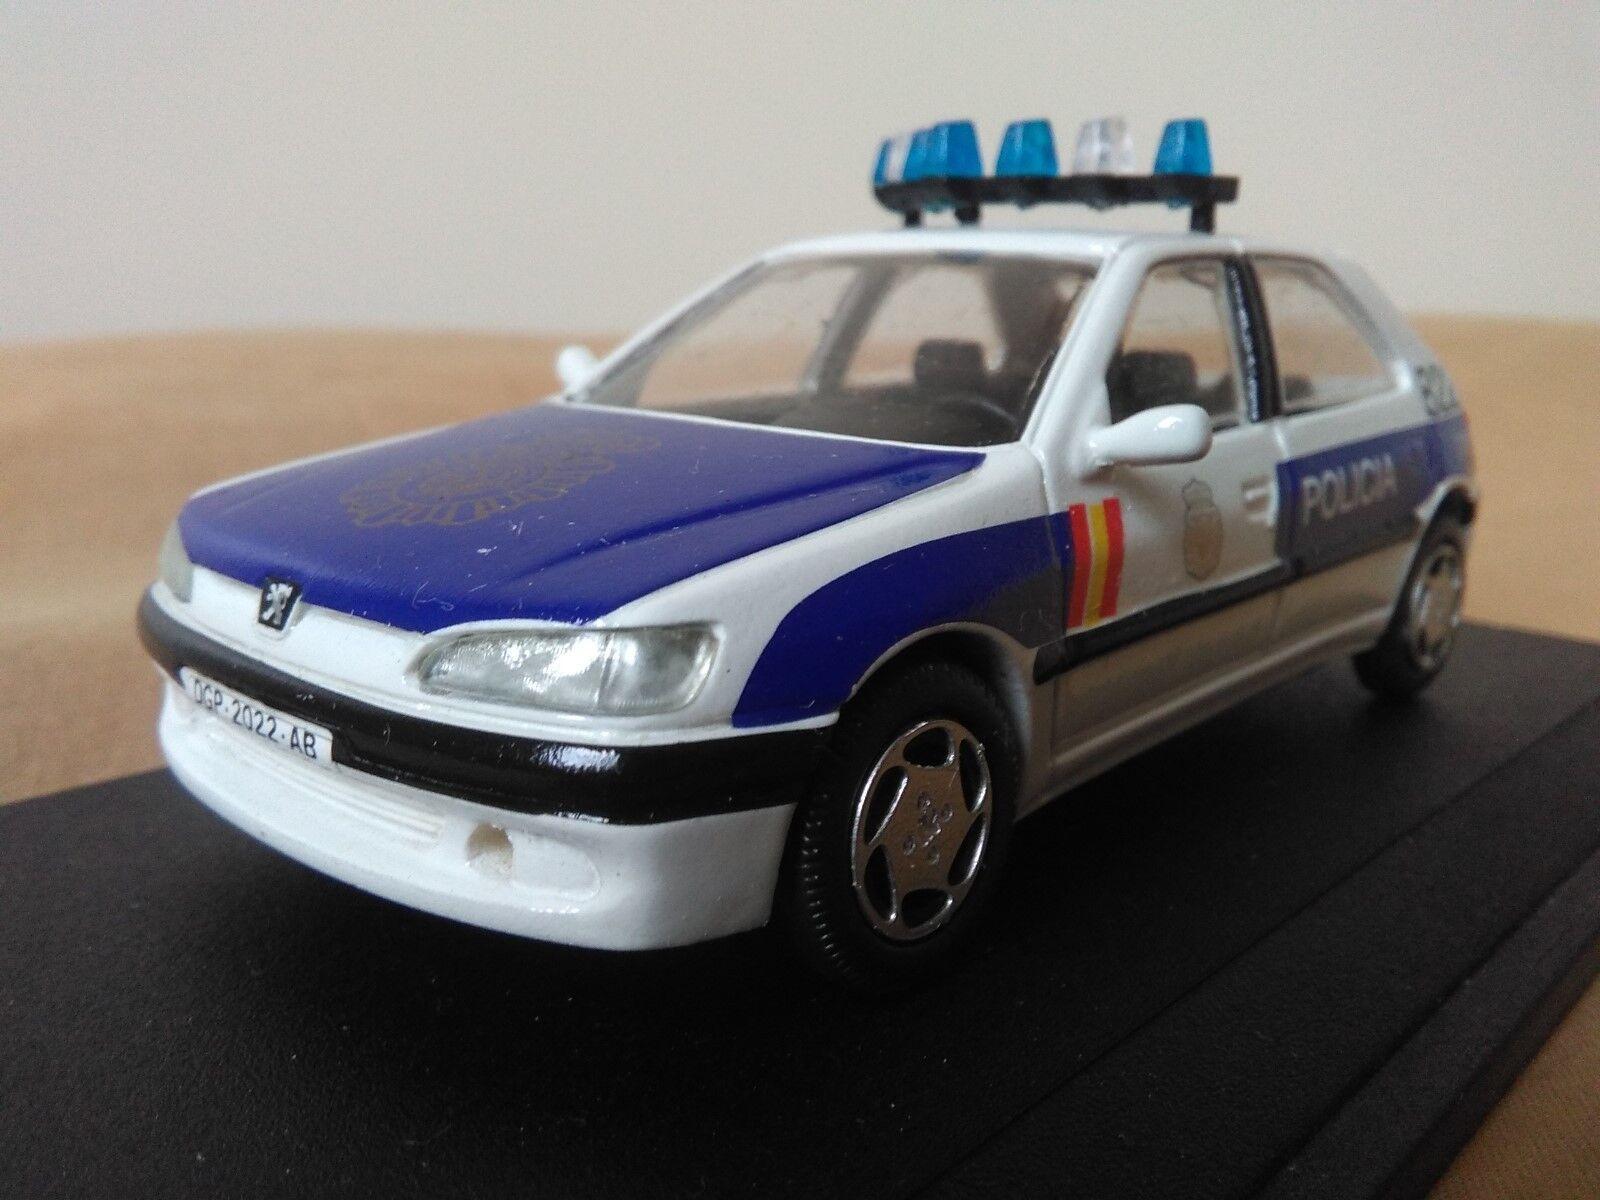 estar en gran demanda Antigua miniatura 1 43 Scale Cocher Cocher Cocher RS020 Peugeot 306 de 1999 Policía Nacional 091  tienda en linea